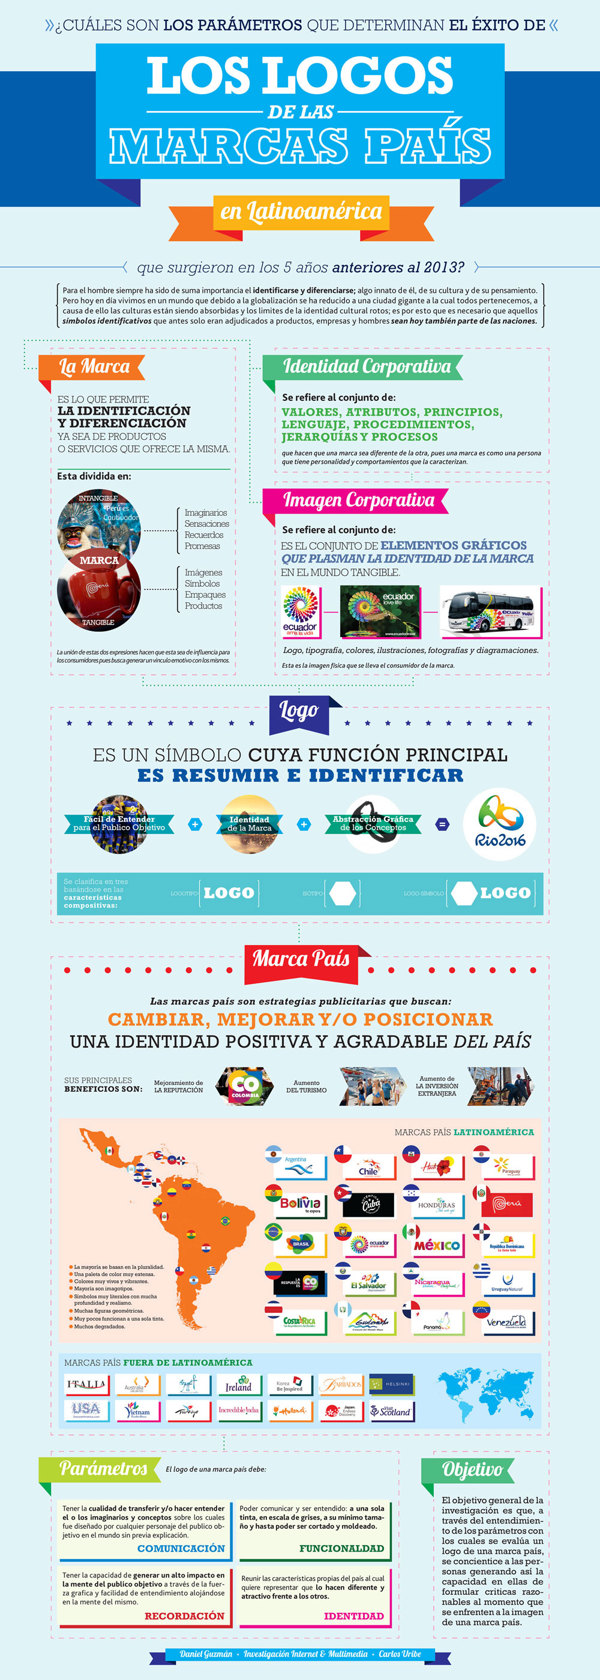 Logos de las Marcas País en Latinoamérica